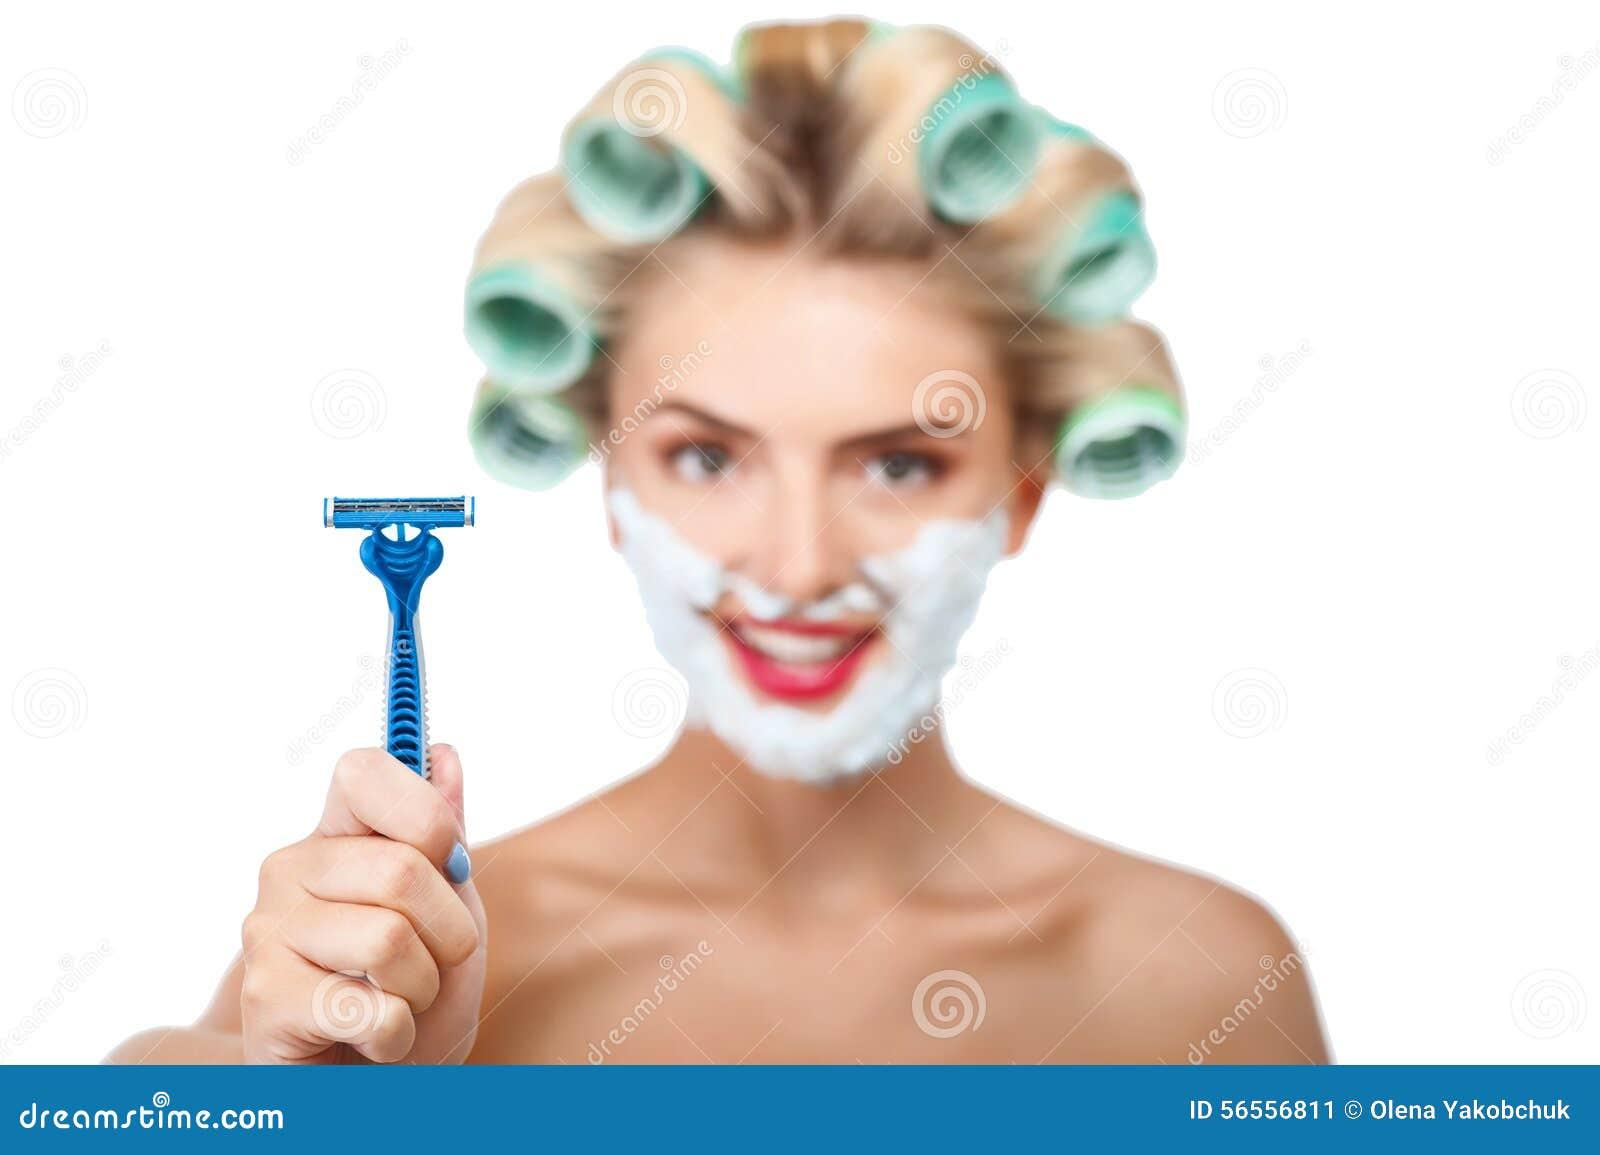 Download Η όμορφη νέα νοικοκυρά προετοιμάζεται για το ξύρισμα Στοκ Εικόνα - εικόνα από ανθρώπινος, pinup: 56556811